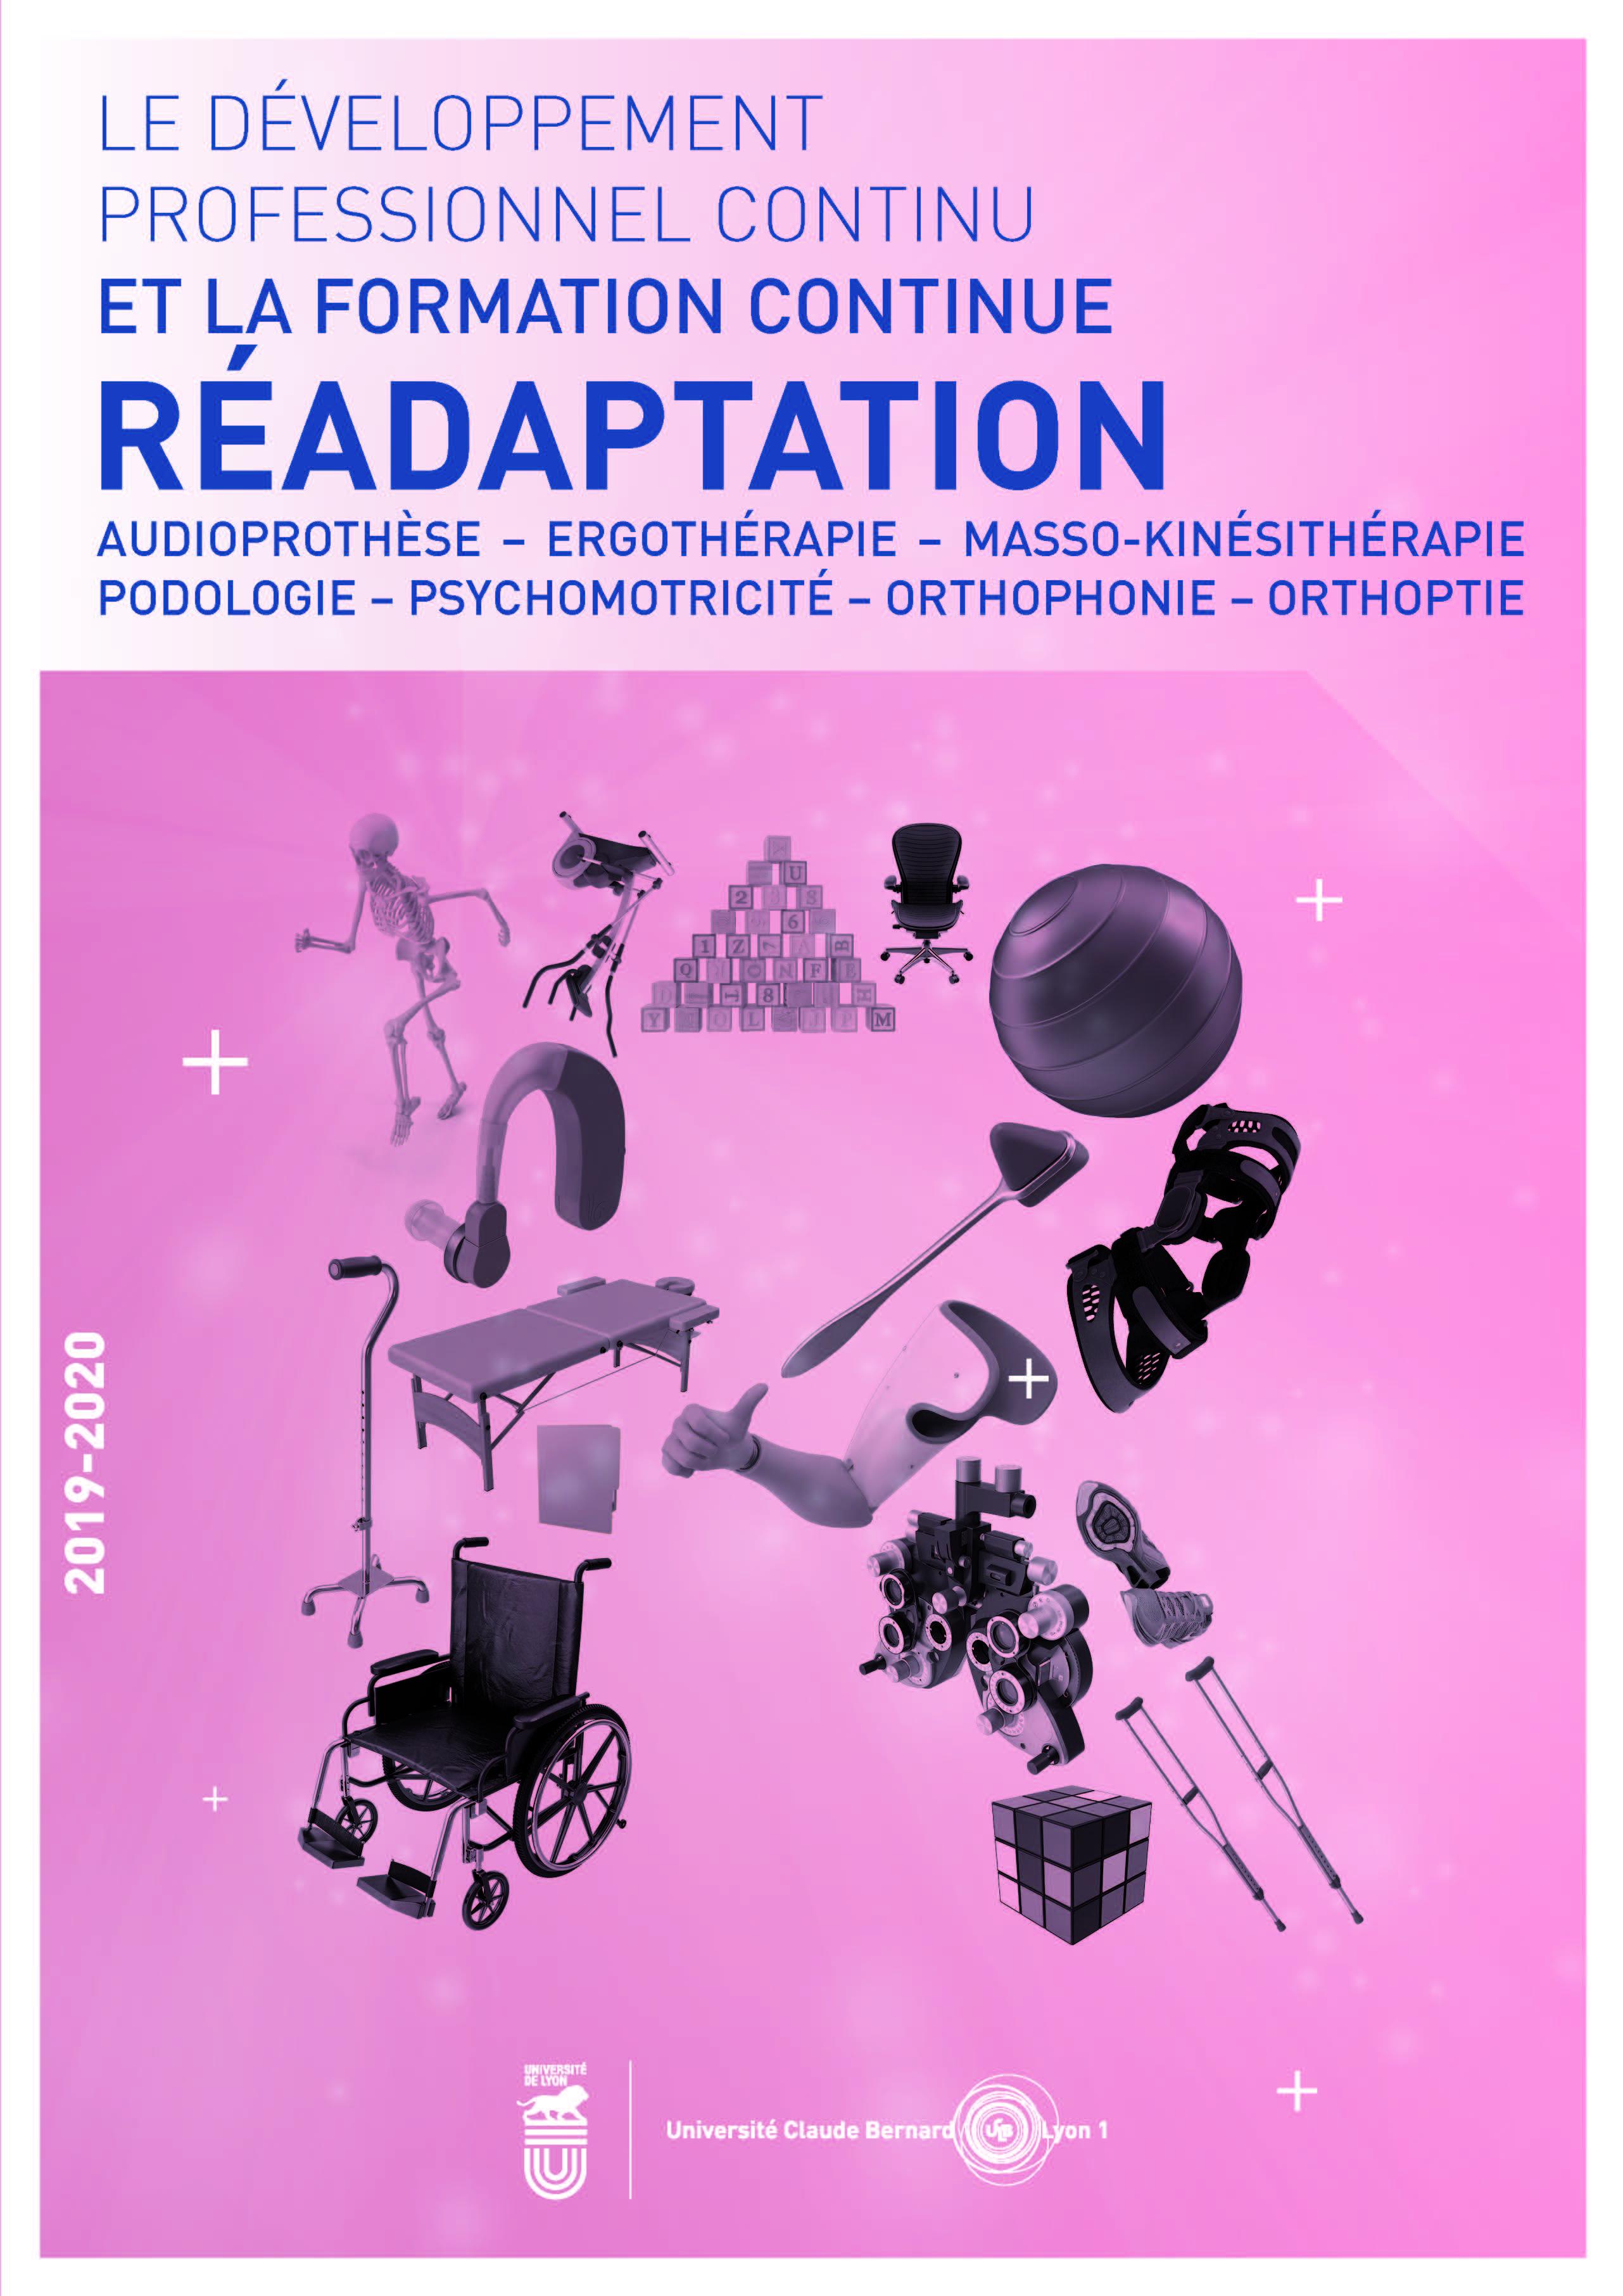 Brochure Readaptation 2019